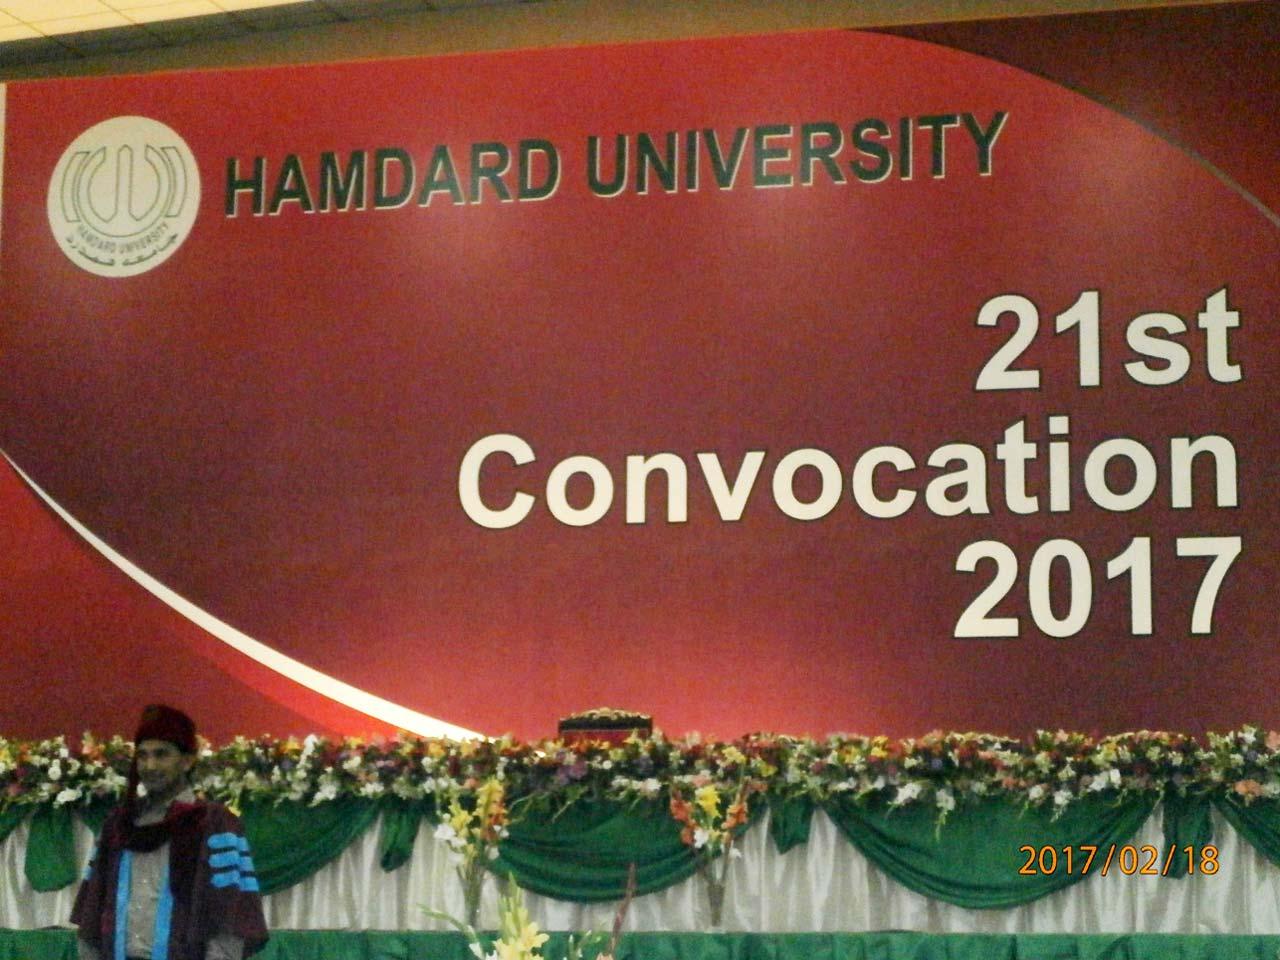 21st Convocation of Hamdard University - 2017